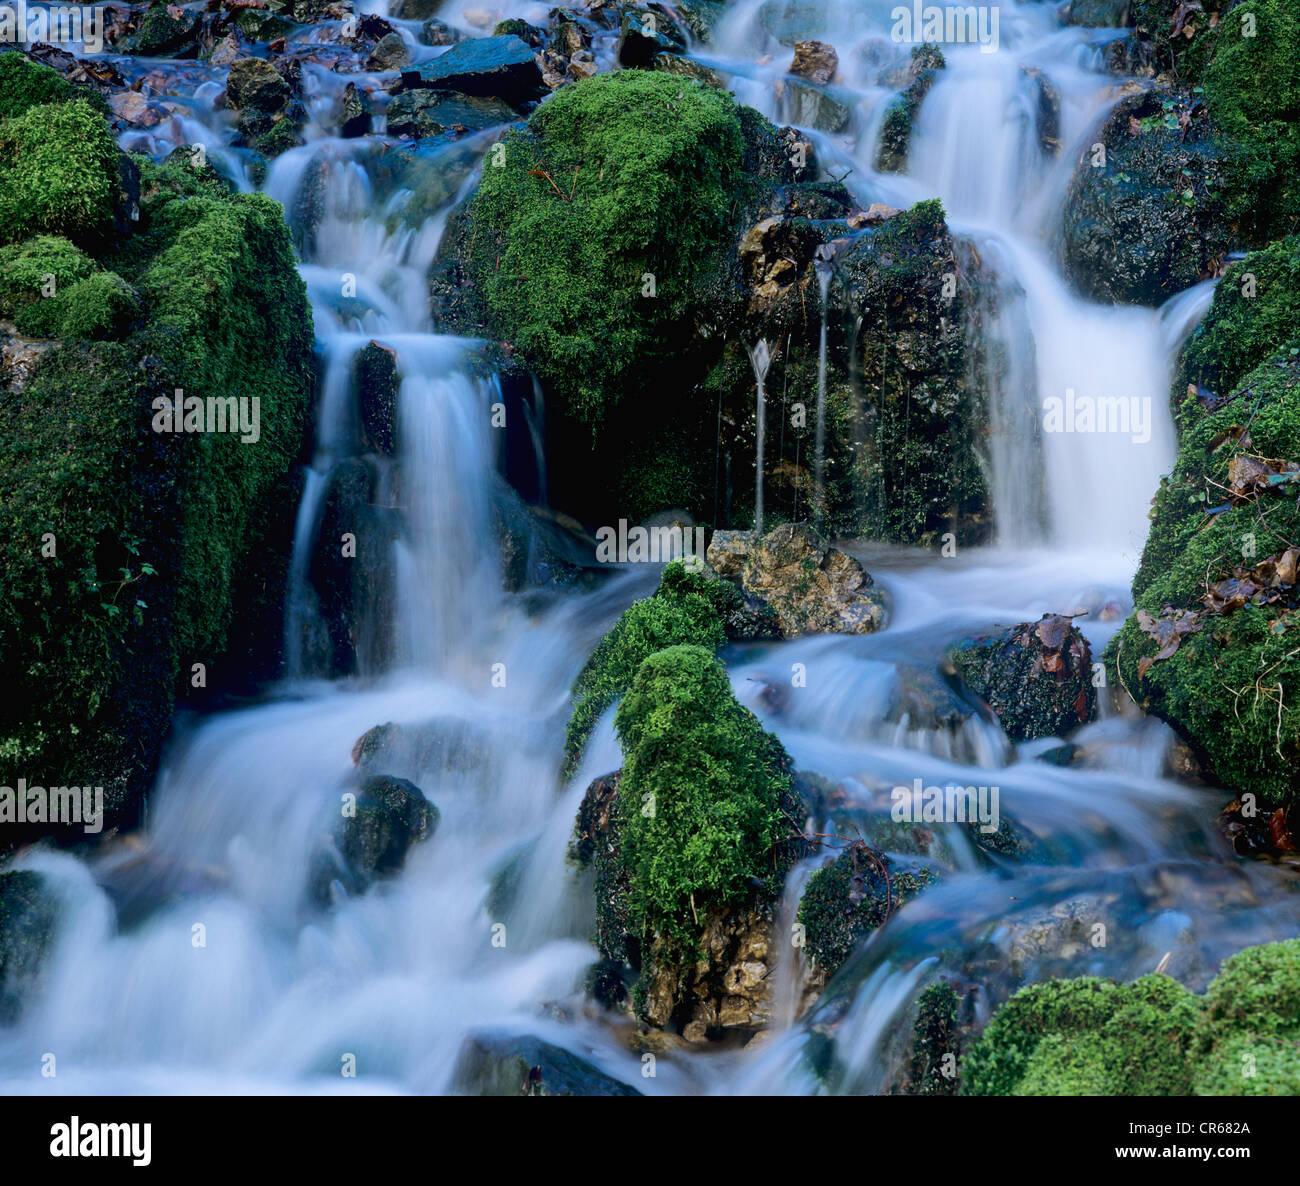 Forest stream flowing over mossy rocks, Glasbach creek, North Rhine-Westphalia, Germany, Europe - Stock Image